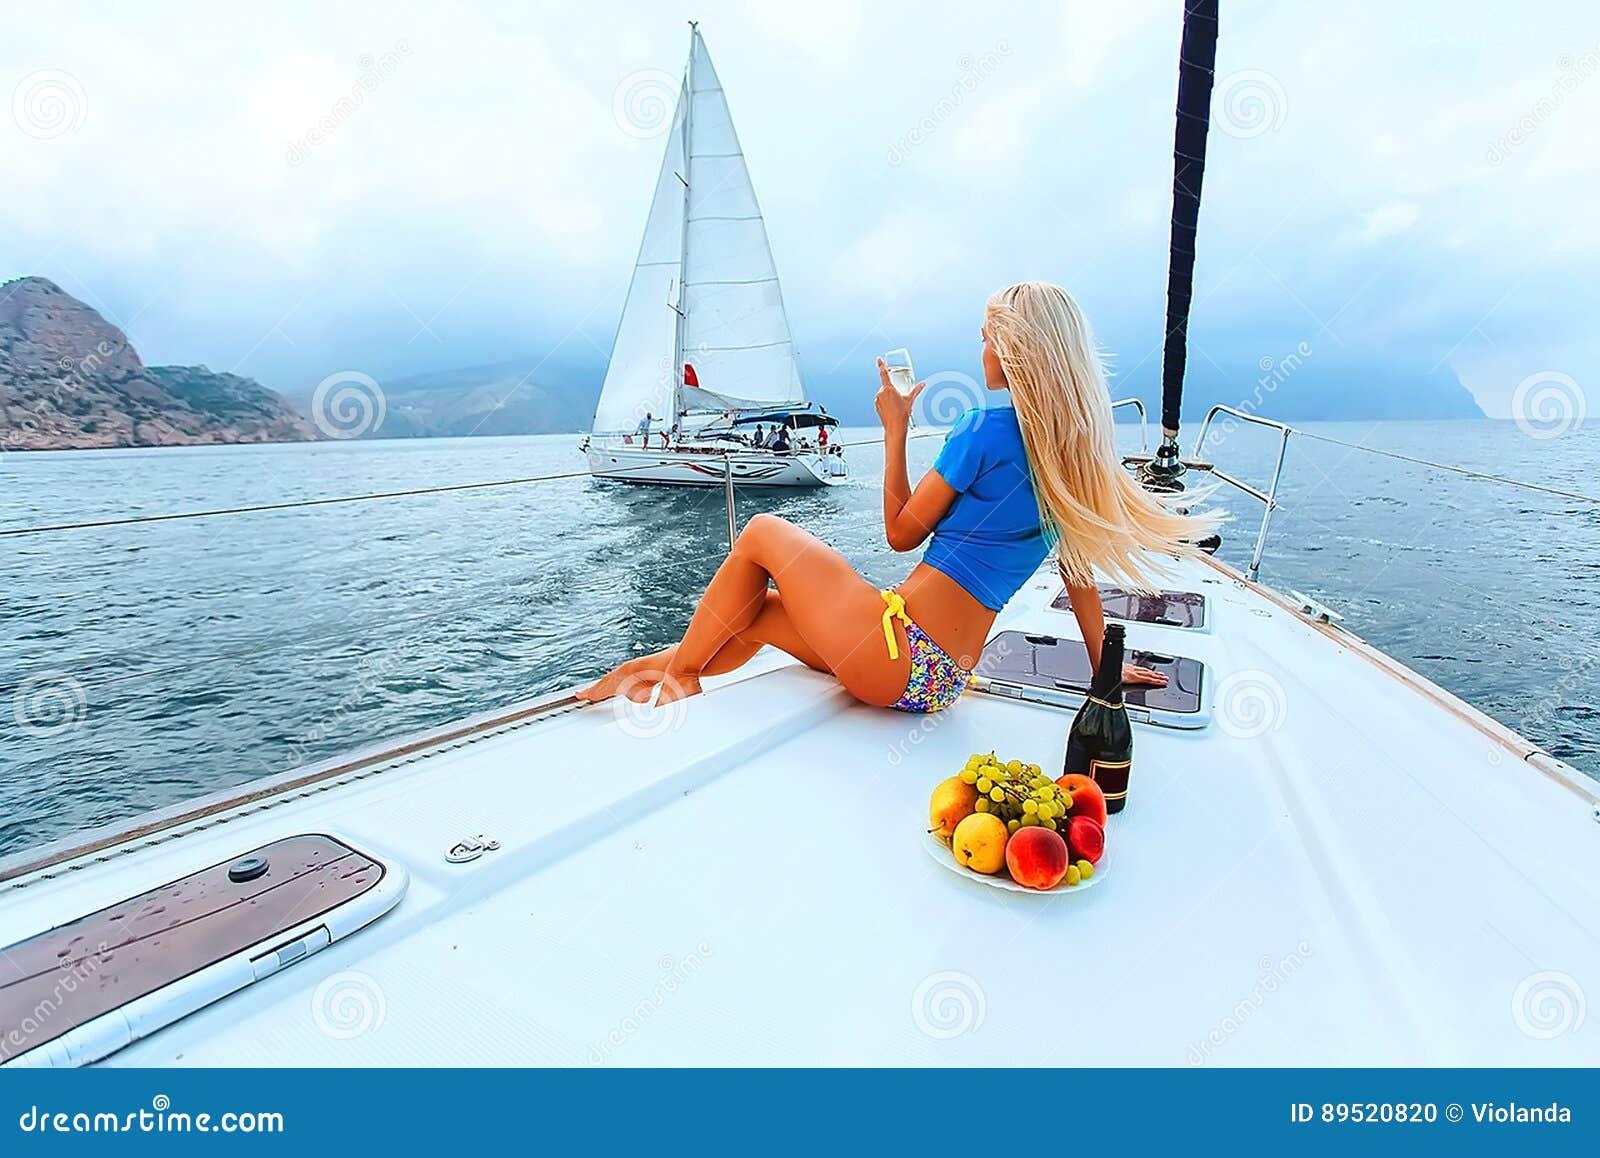 Красивые блондинки на яхте фото 330-172